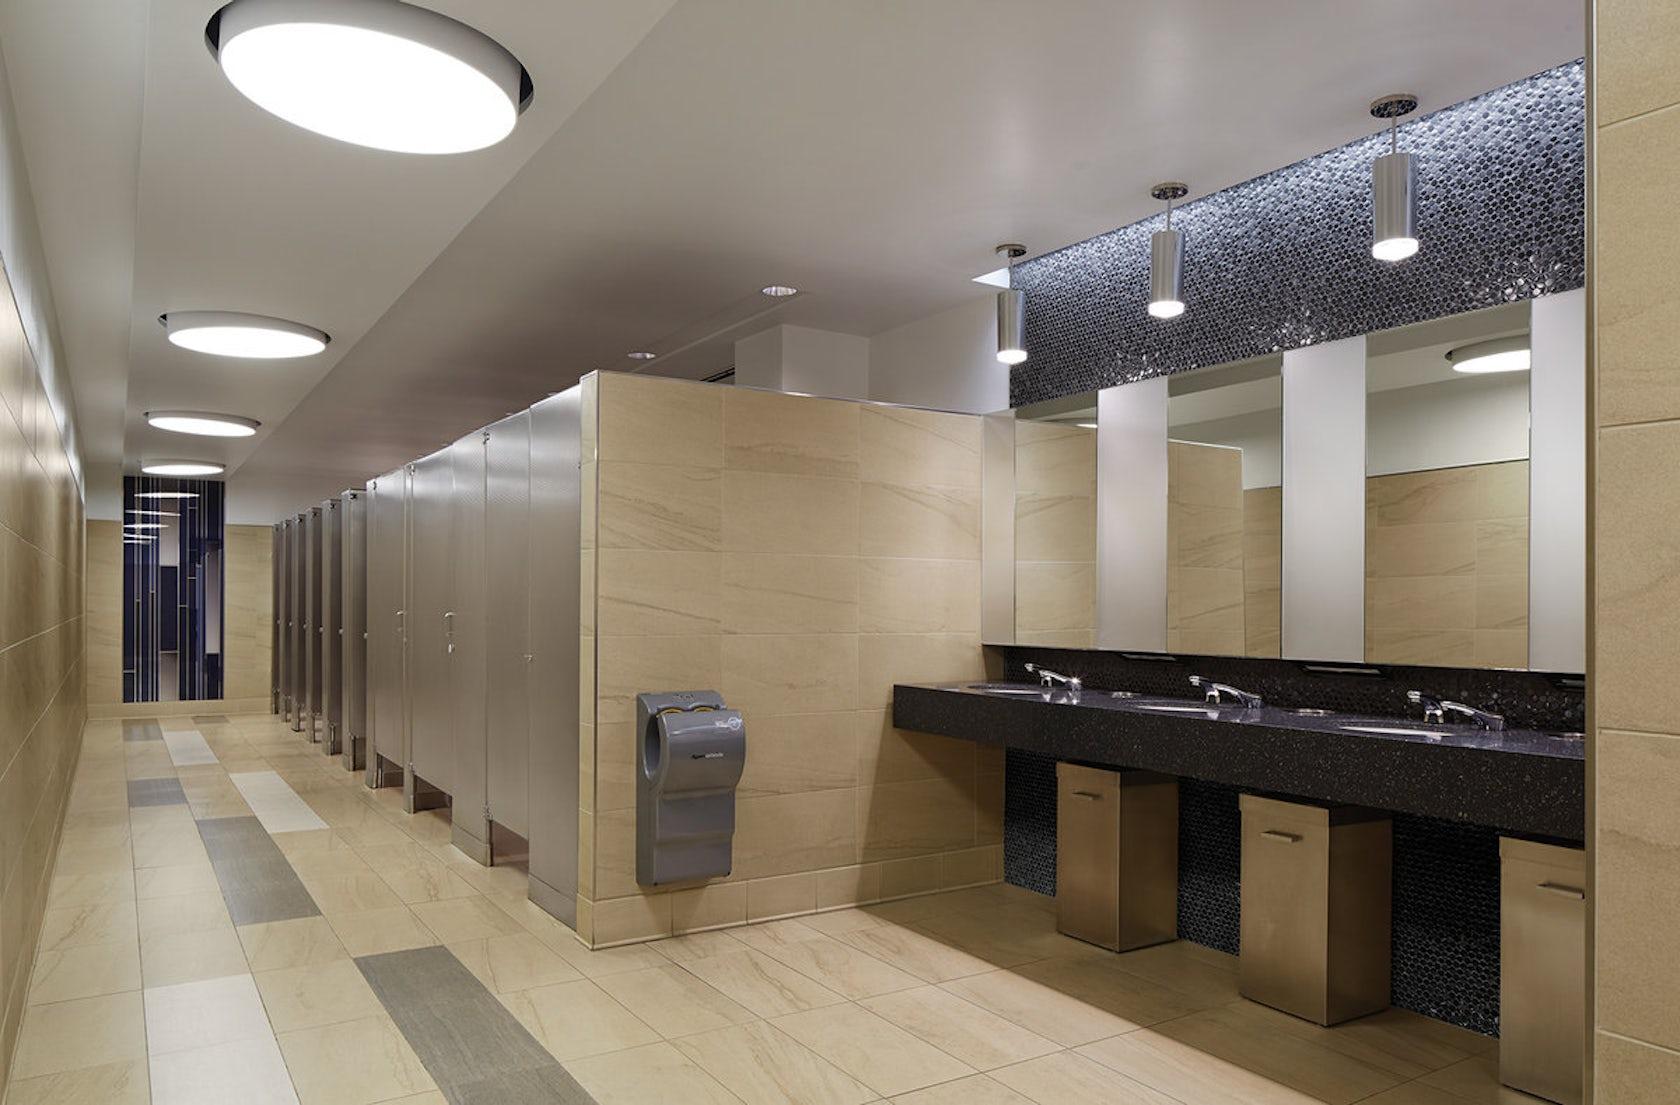 5 Star Auto >> O'Hare International Airport, Terminal 5 - Architizer